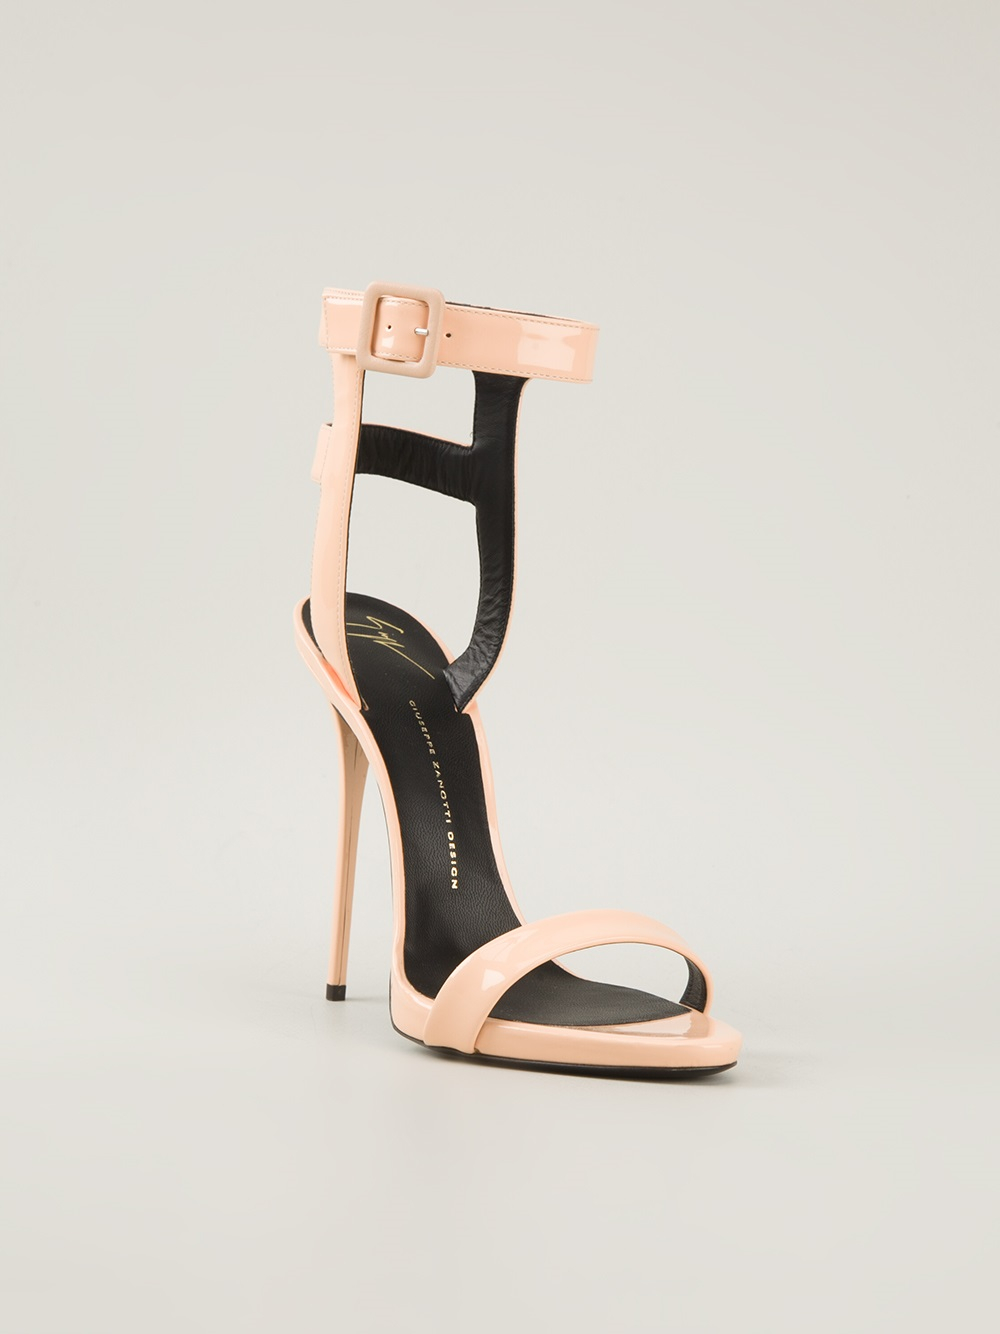 Giuseppe Zanotti Caged Platform Sandals footlocker pictures online stockist online KSBtW